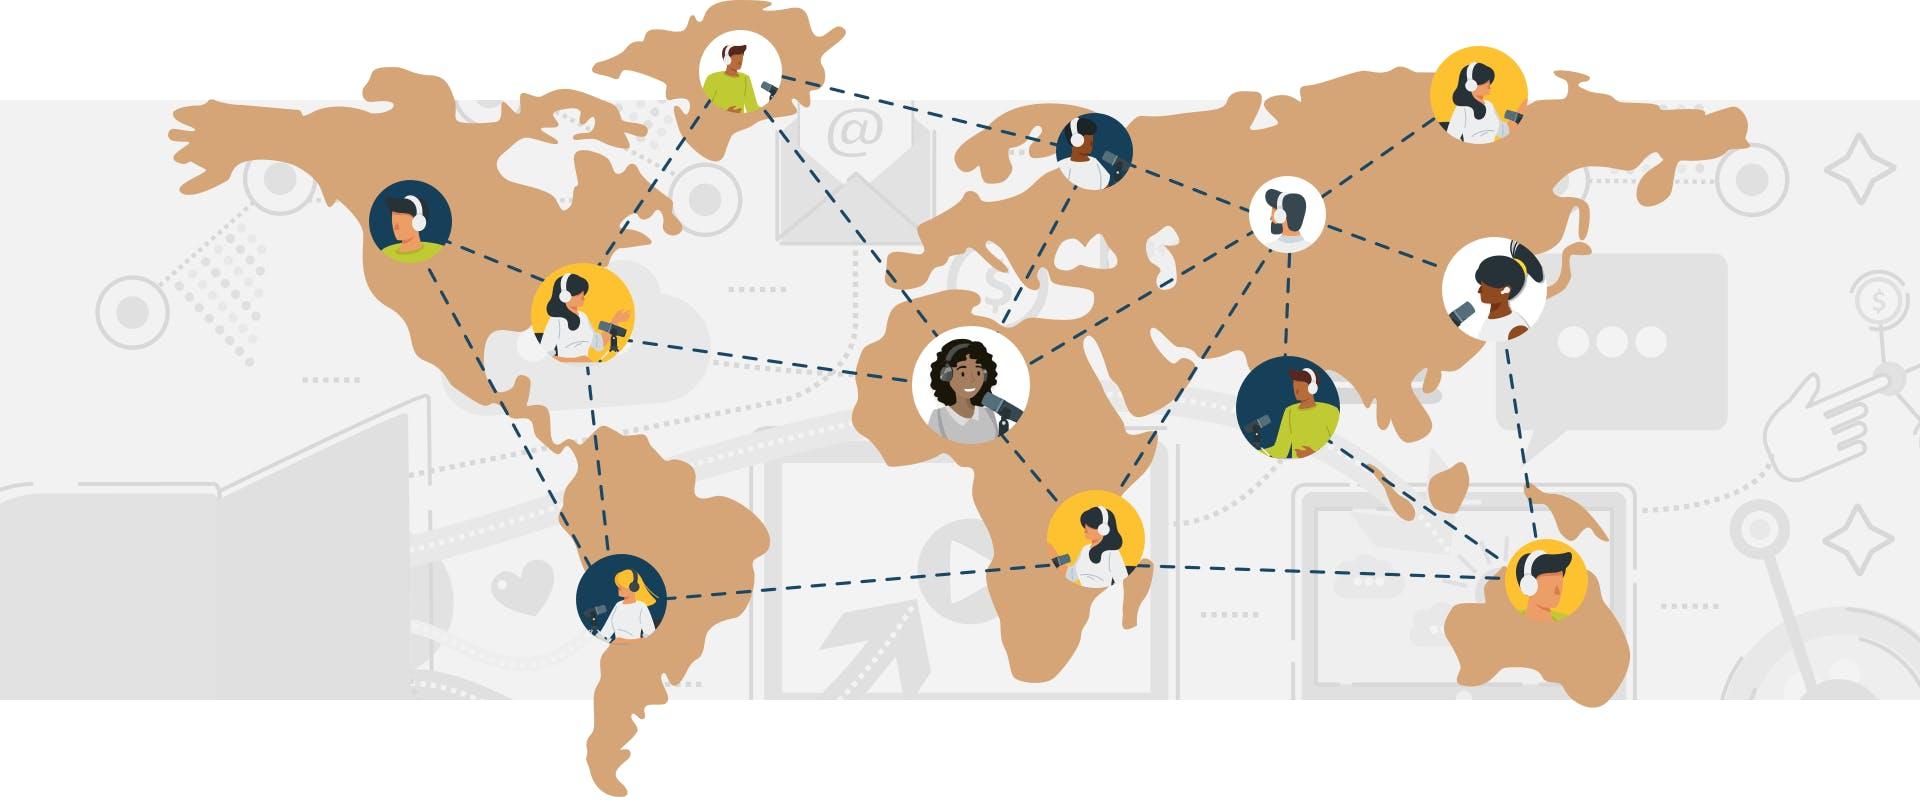 Podcast Network around the entire globe